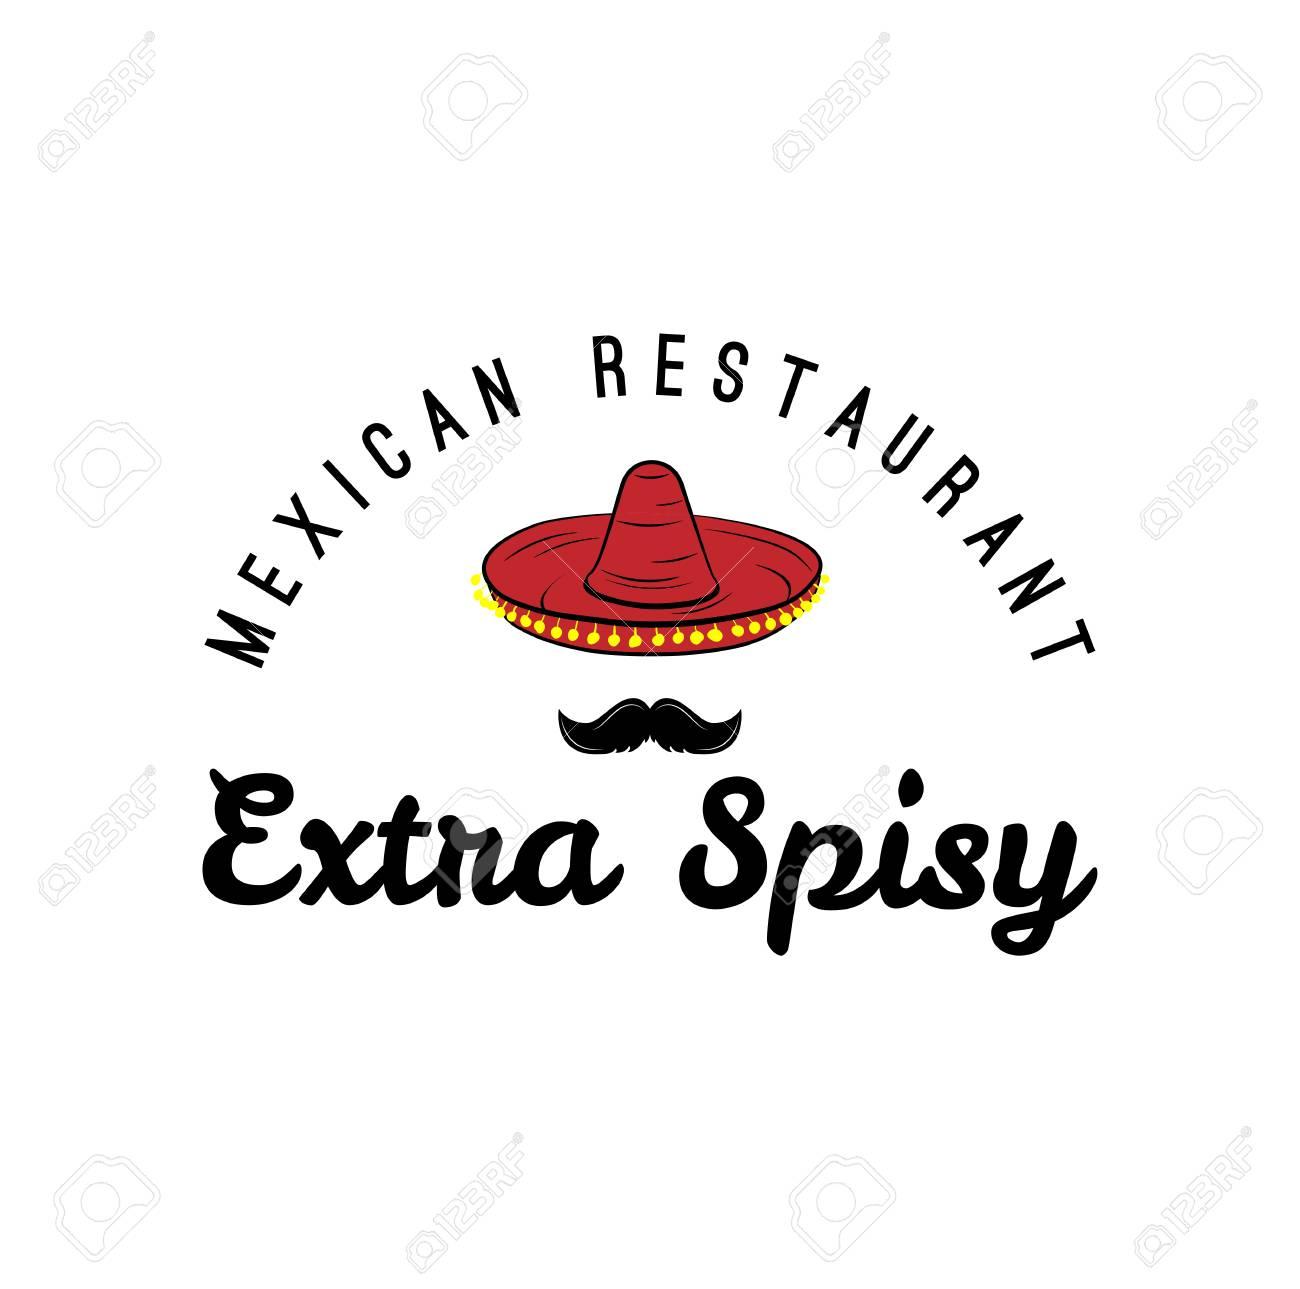 Sombrero Y Bigote Etiqueta. México Alimentos. Tradicional Signo ...